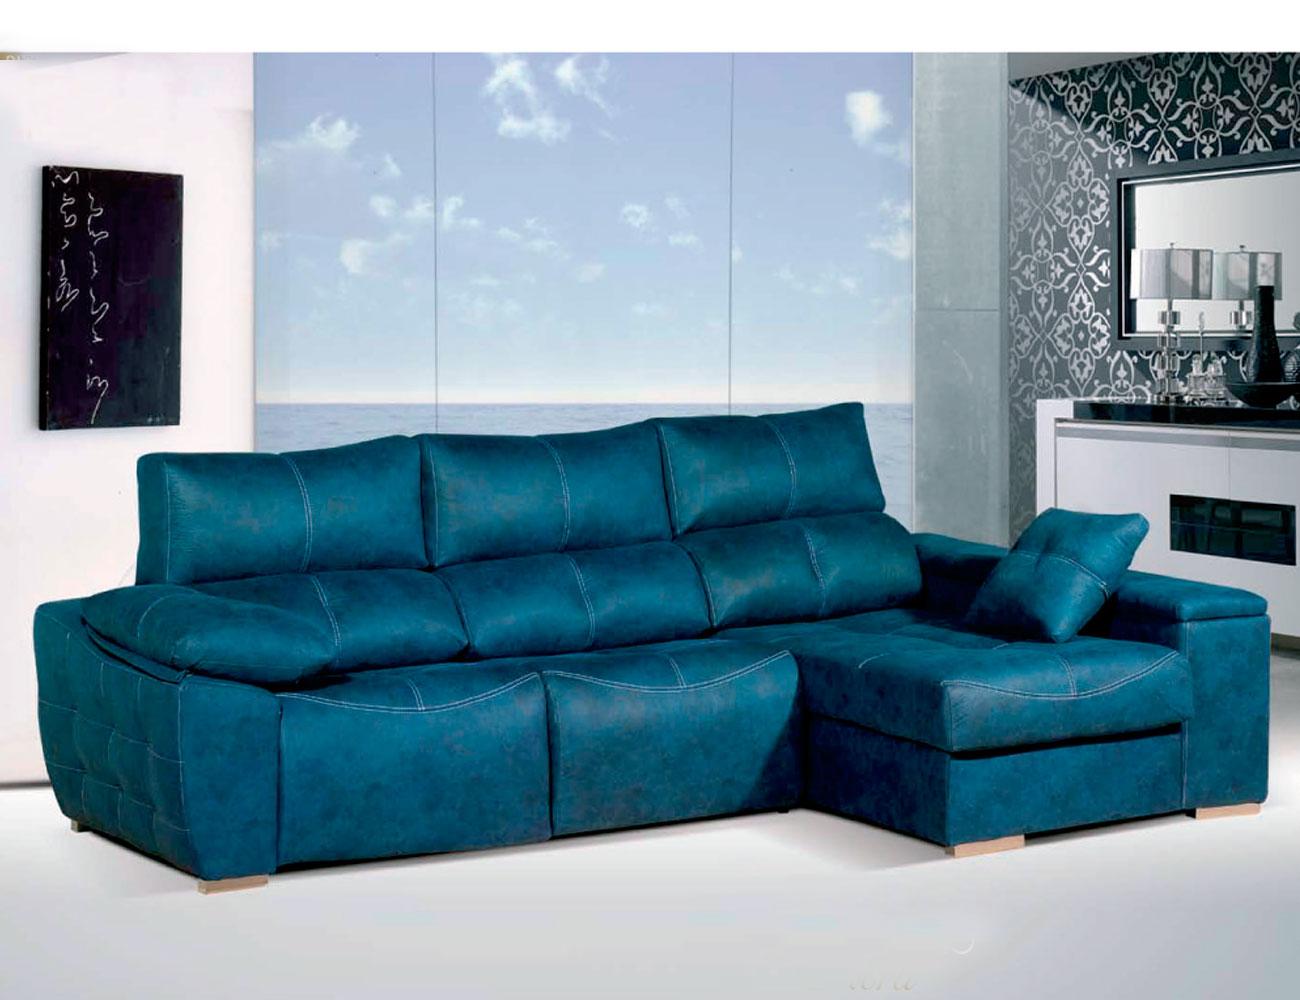 Sofa chaiselongue relax 2 motores anti manchas turquesa31